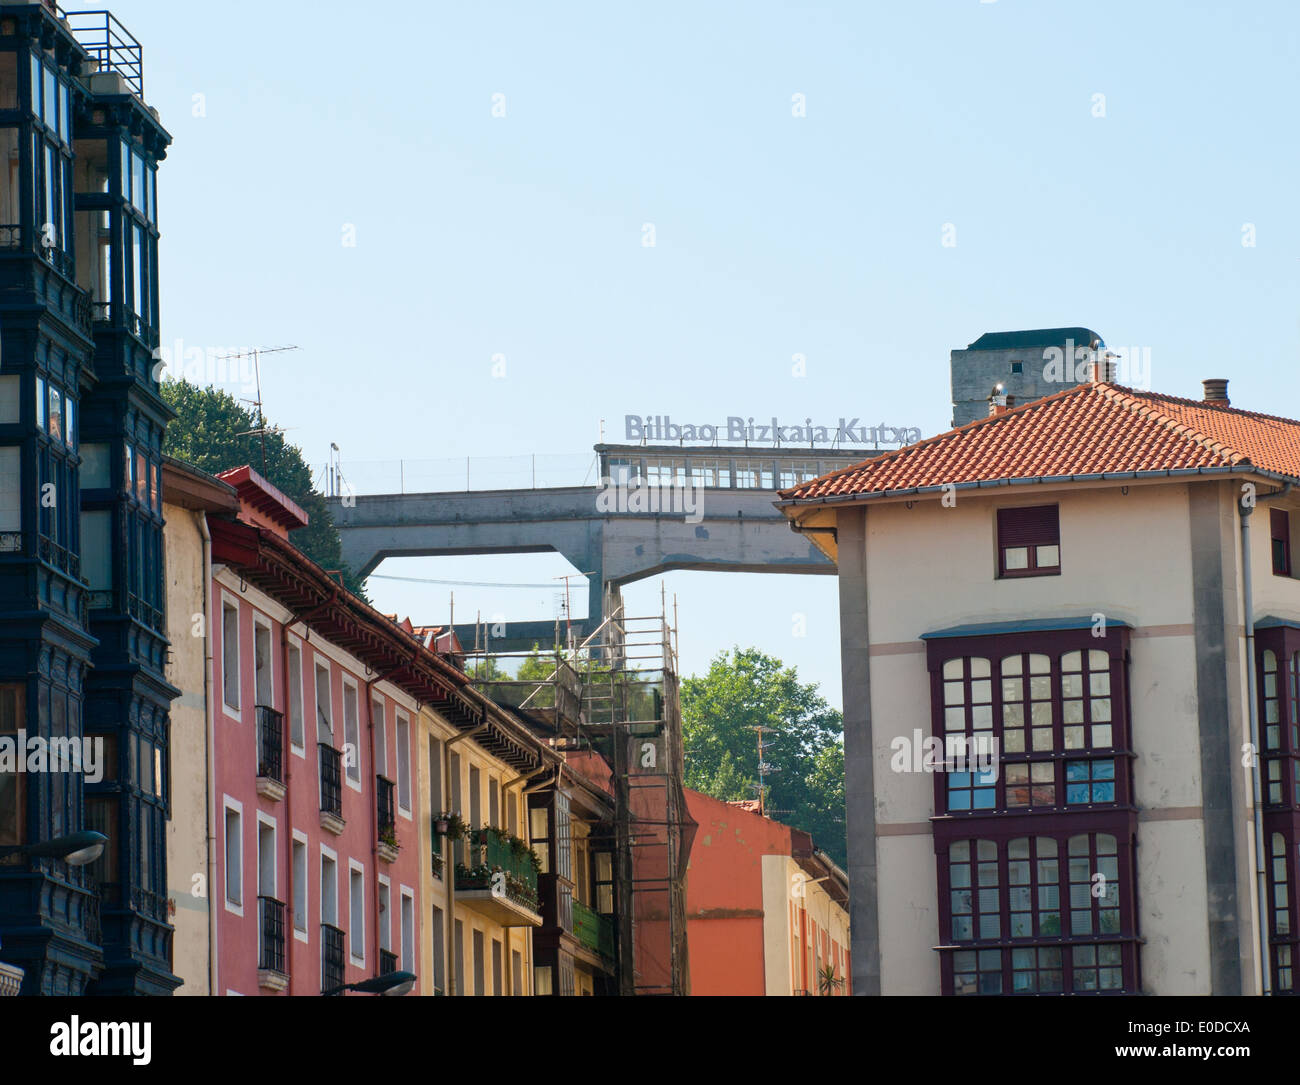 Die bunten Gebäude der Itxaropen Kalea, Casco Viejo (Altstadt), Bilbao, Spanien. Bilbao Bizkaia Kutxa Zeichen in der Ferne. Stockbild